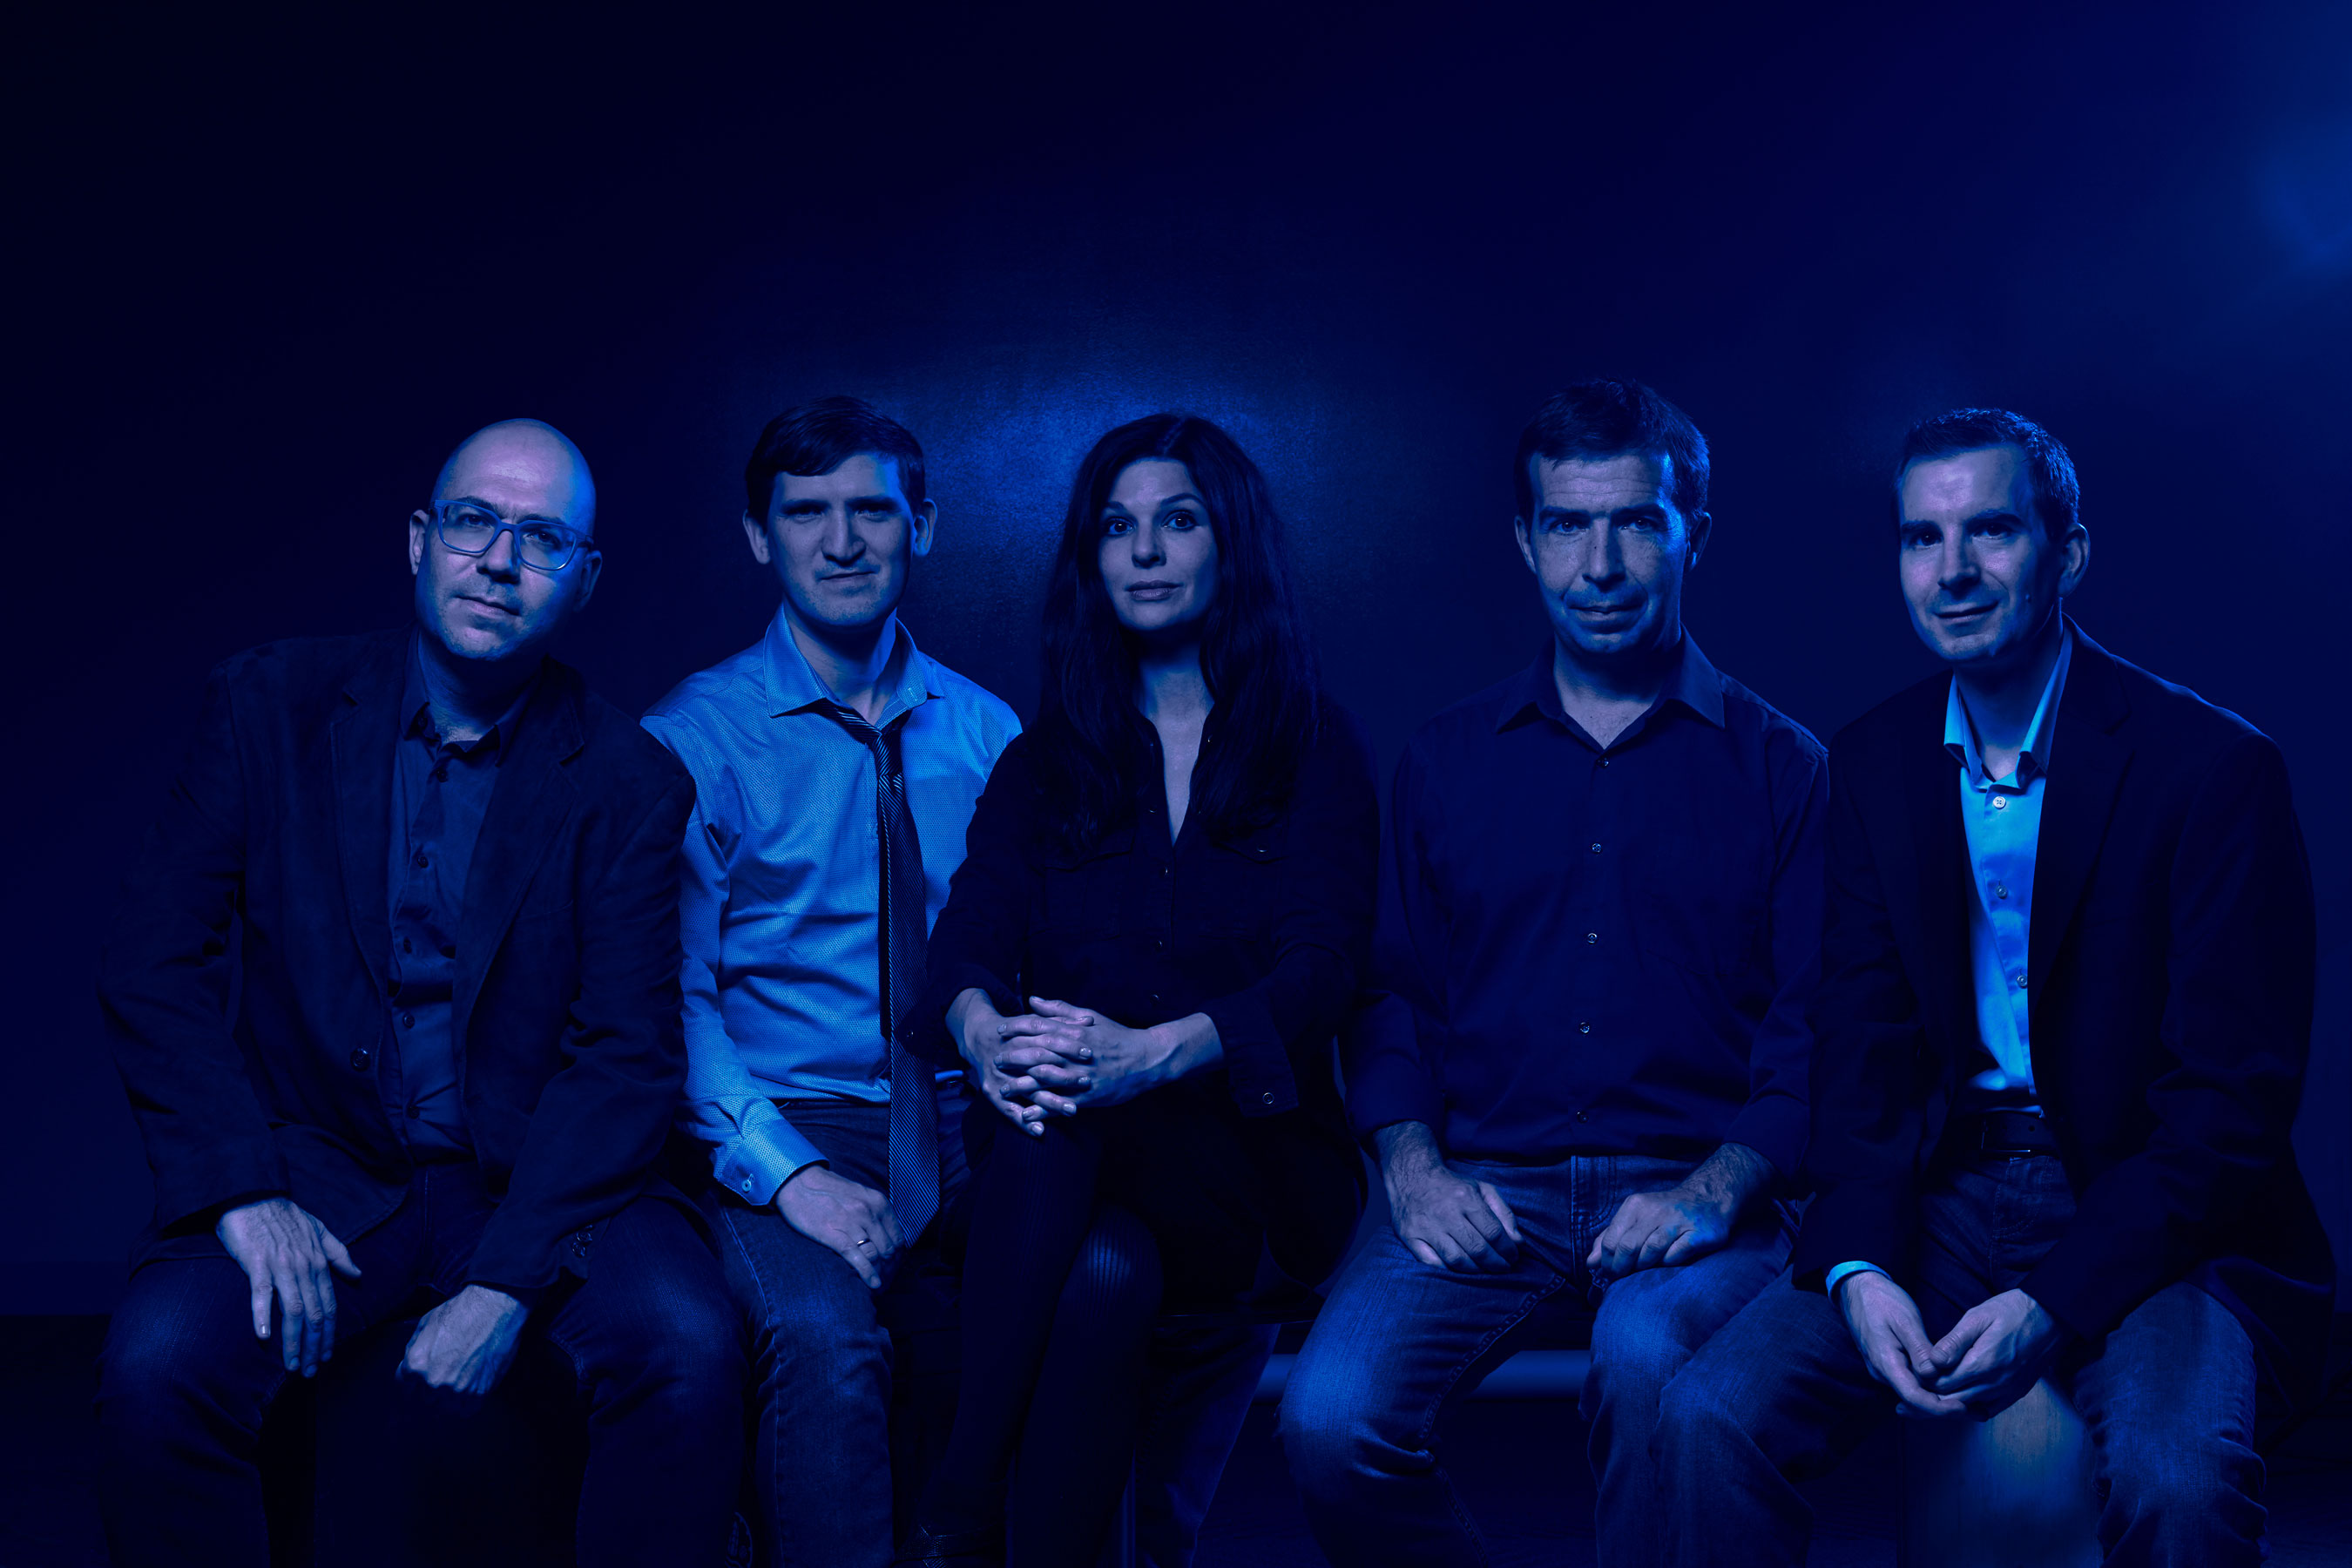 Los fundadores de Kebotix: Alán Aspuru-Guzik, Dennis Sheberla, Jill Becker, Semion Saikin y Christoph Kreisbeck.